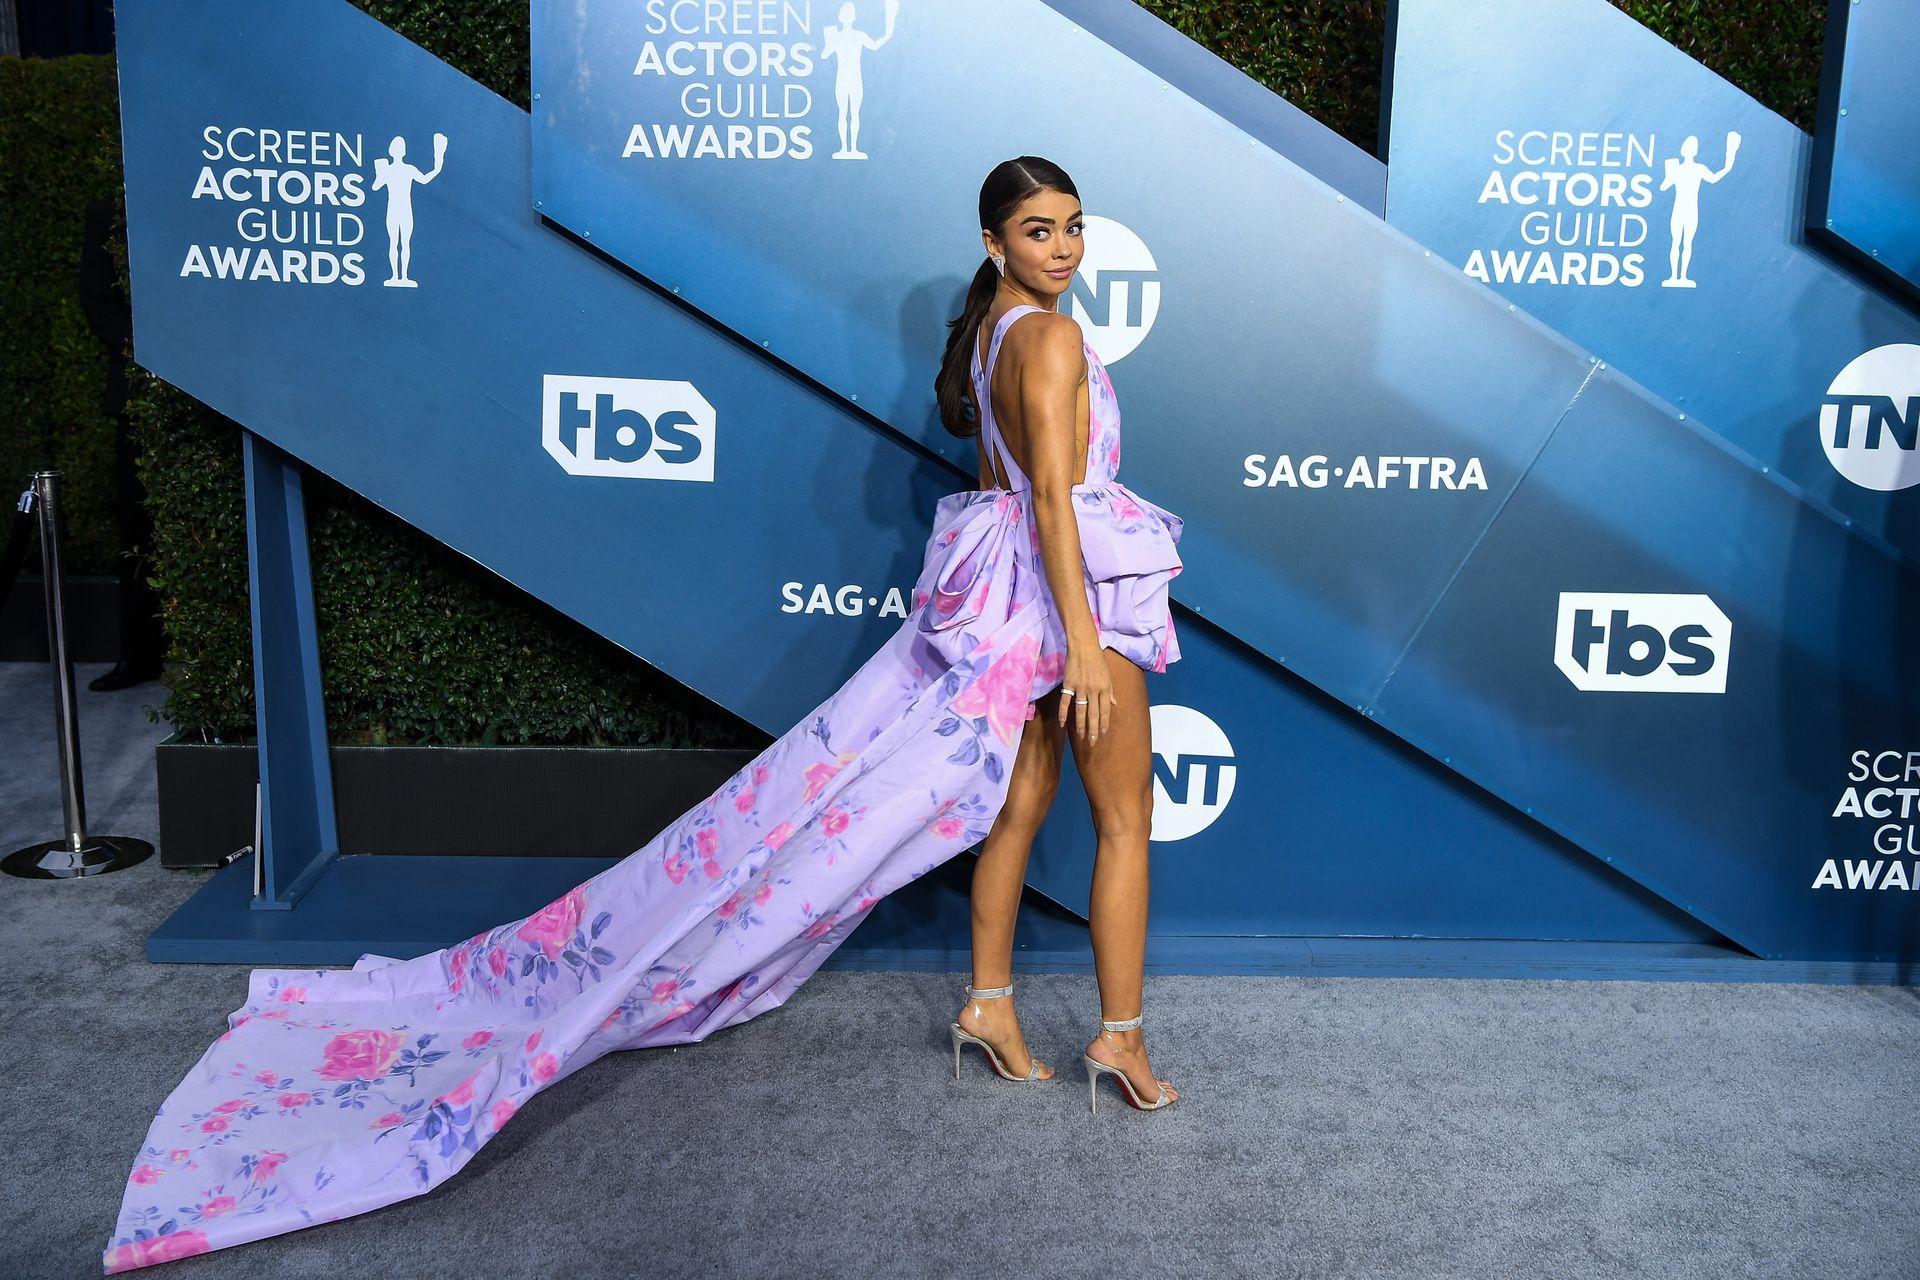 Sarah Hyland Stuns At The Screen Actors Guild Awards 0044